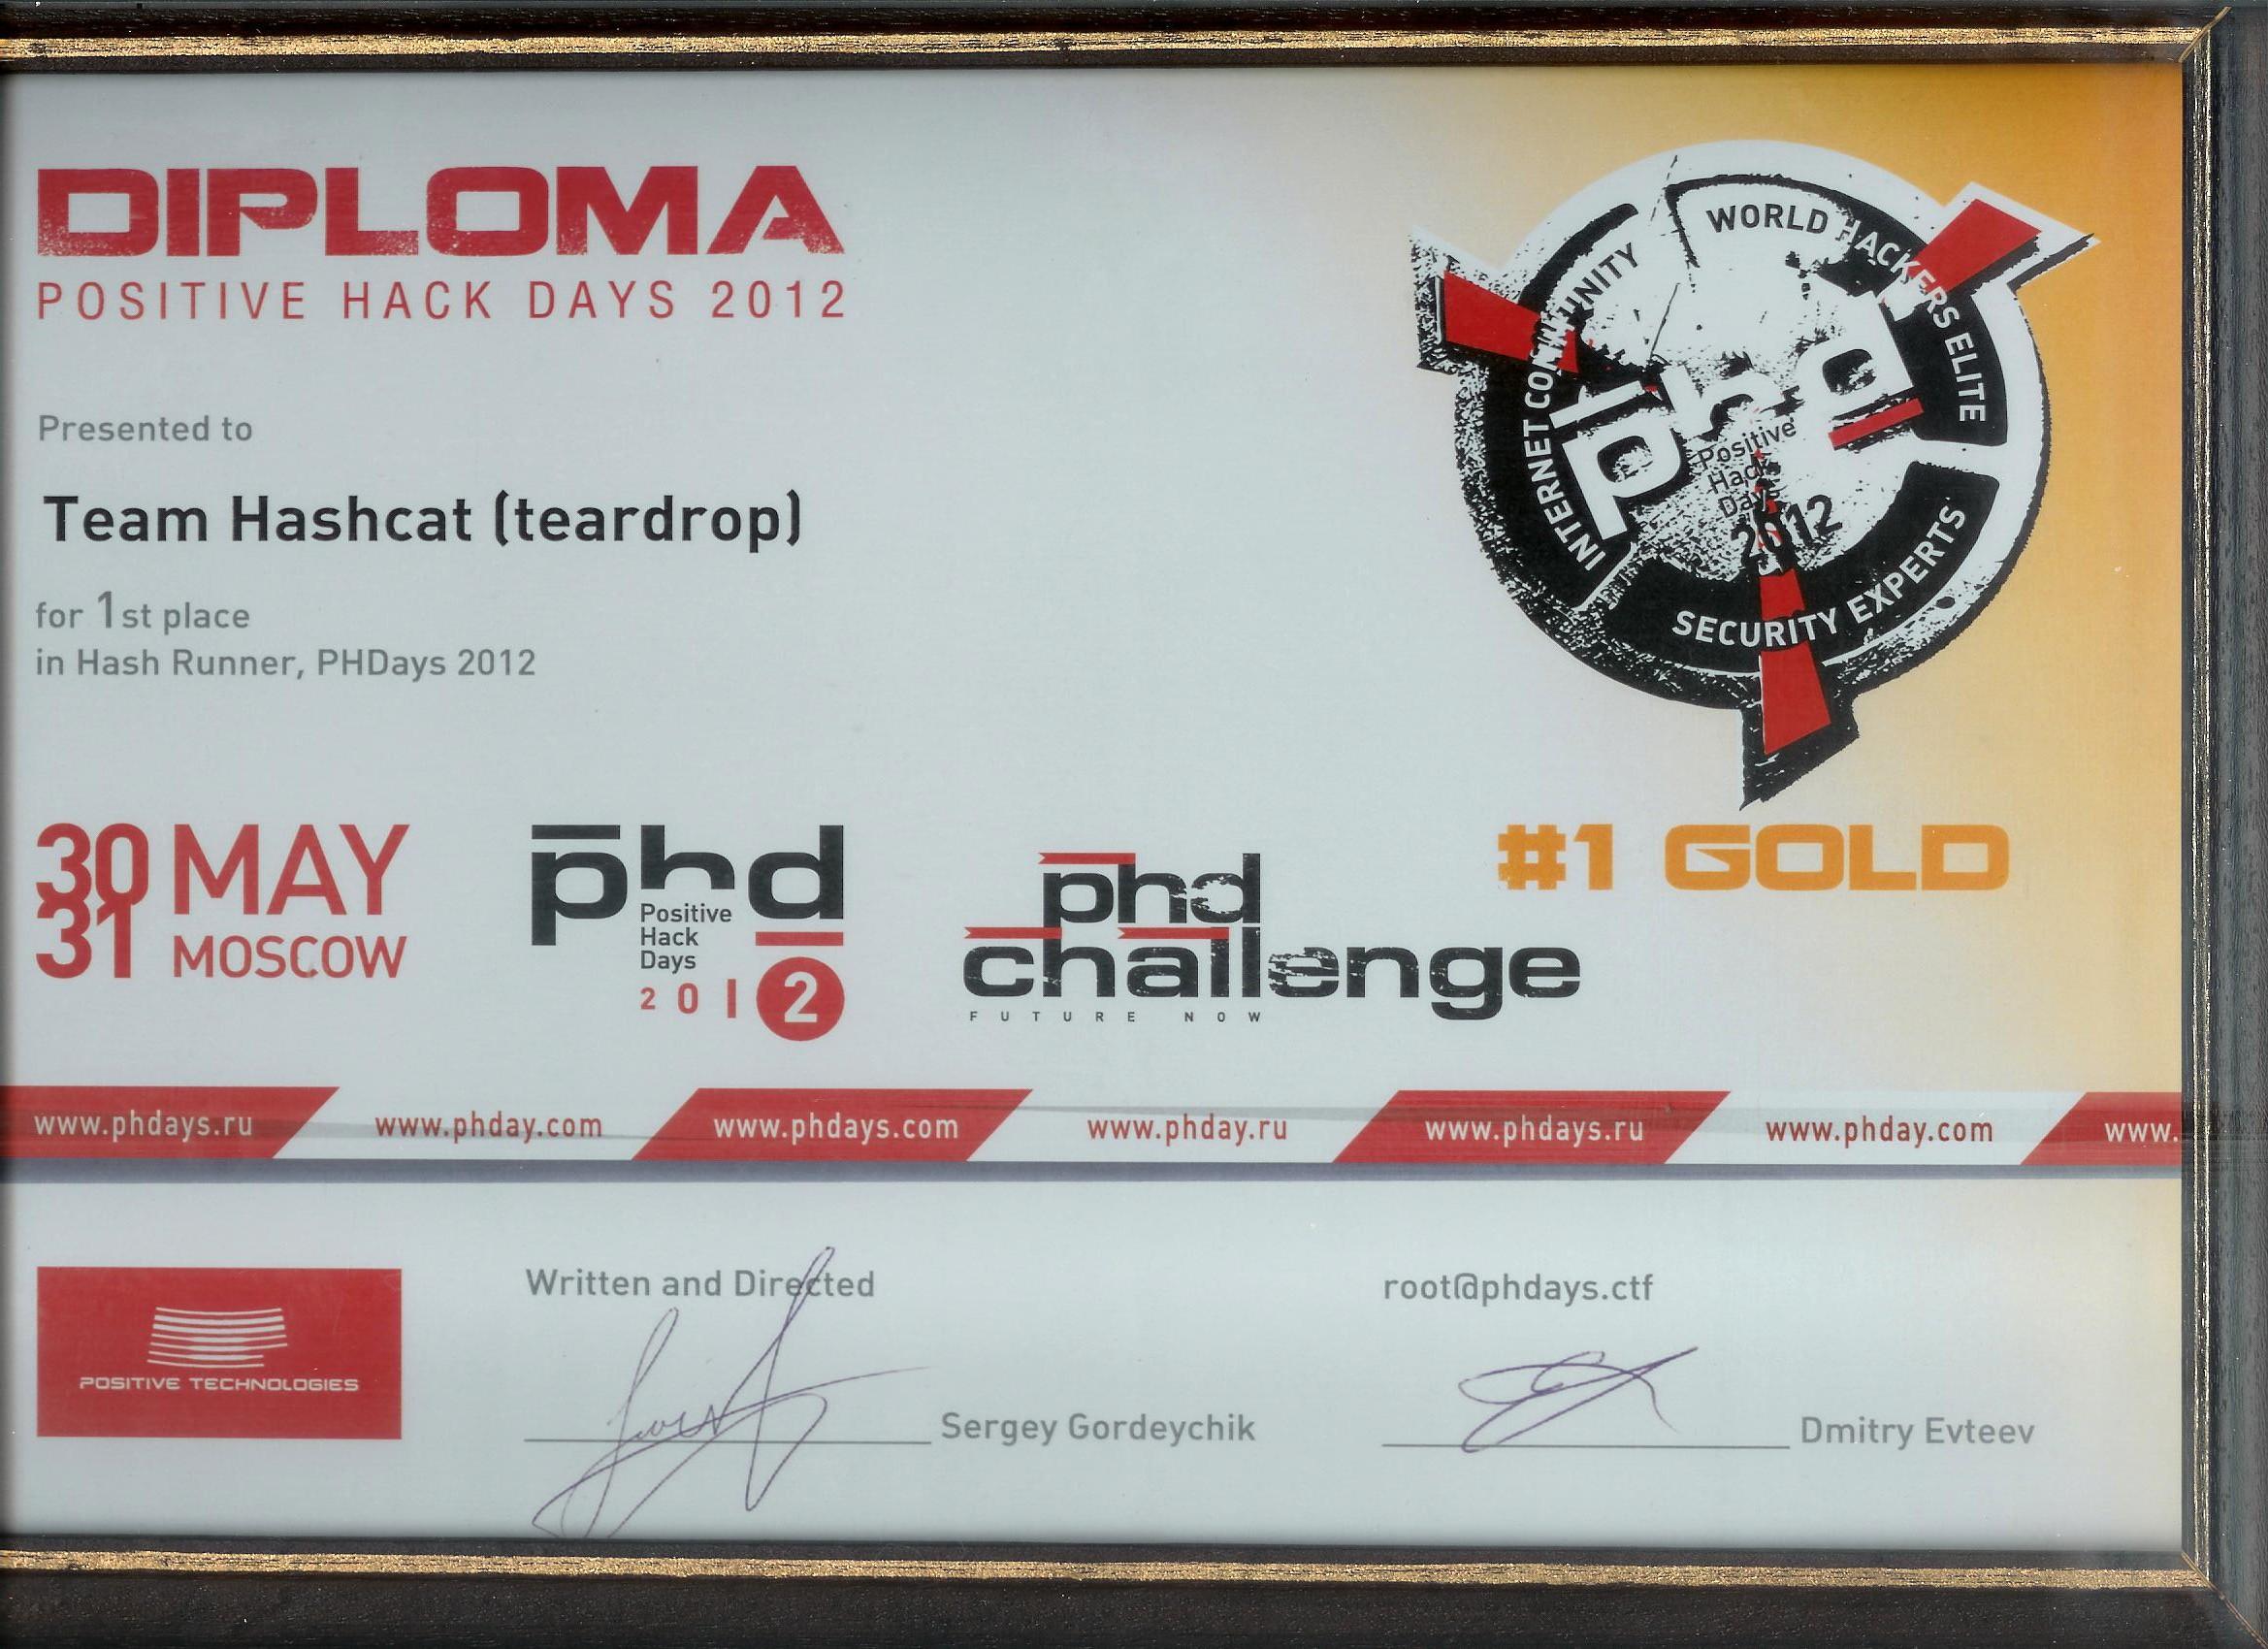 [Image: diploma_phd_team_hashcat.jpg]